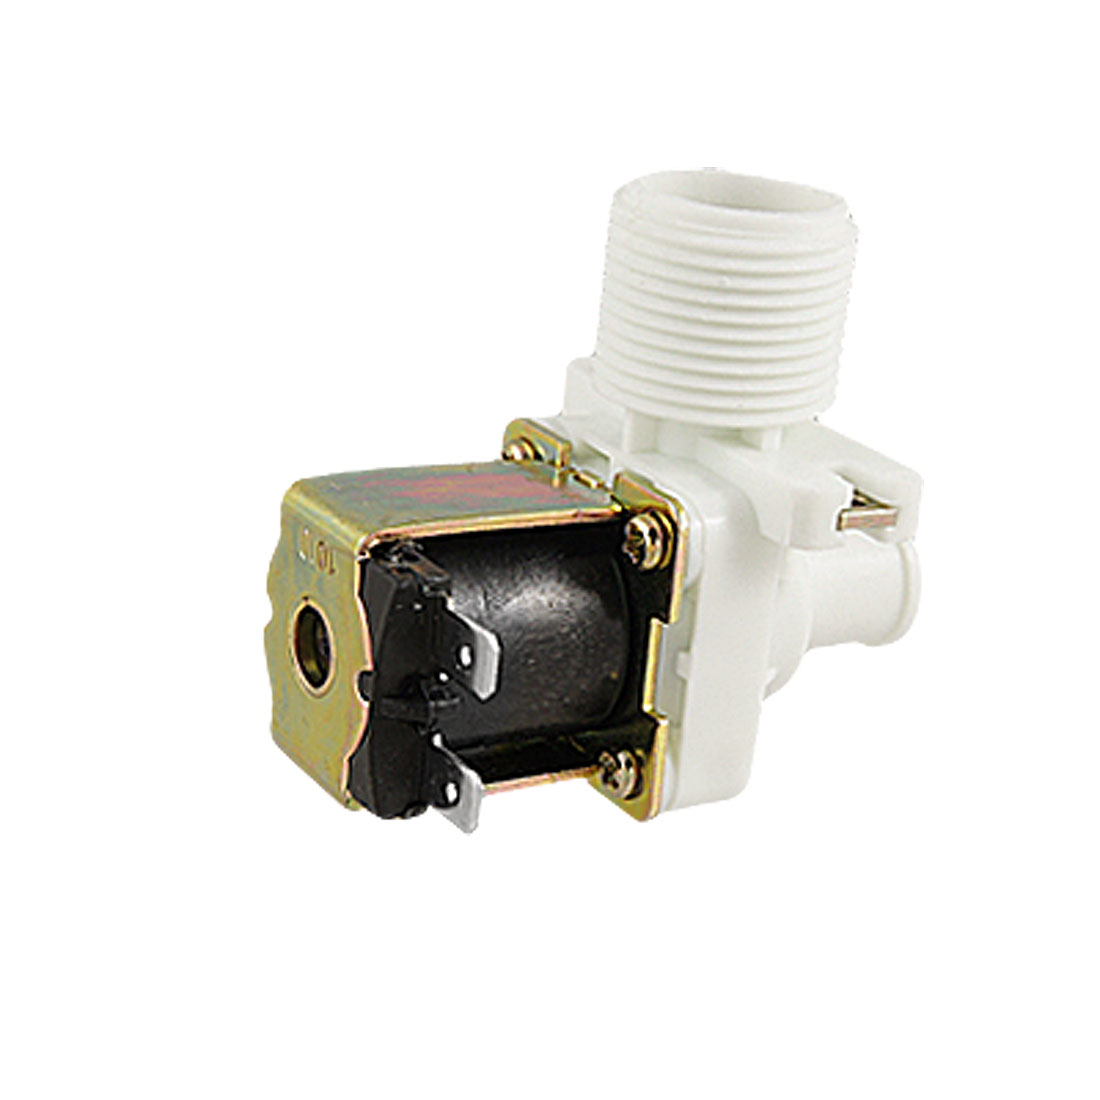 AC 220V 26mm Thread 90 Degree Water Inlet Solenoid Valve Black White